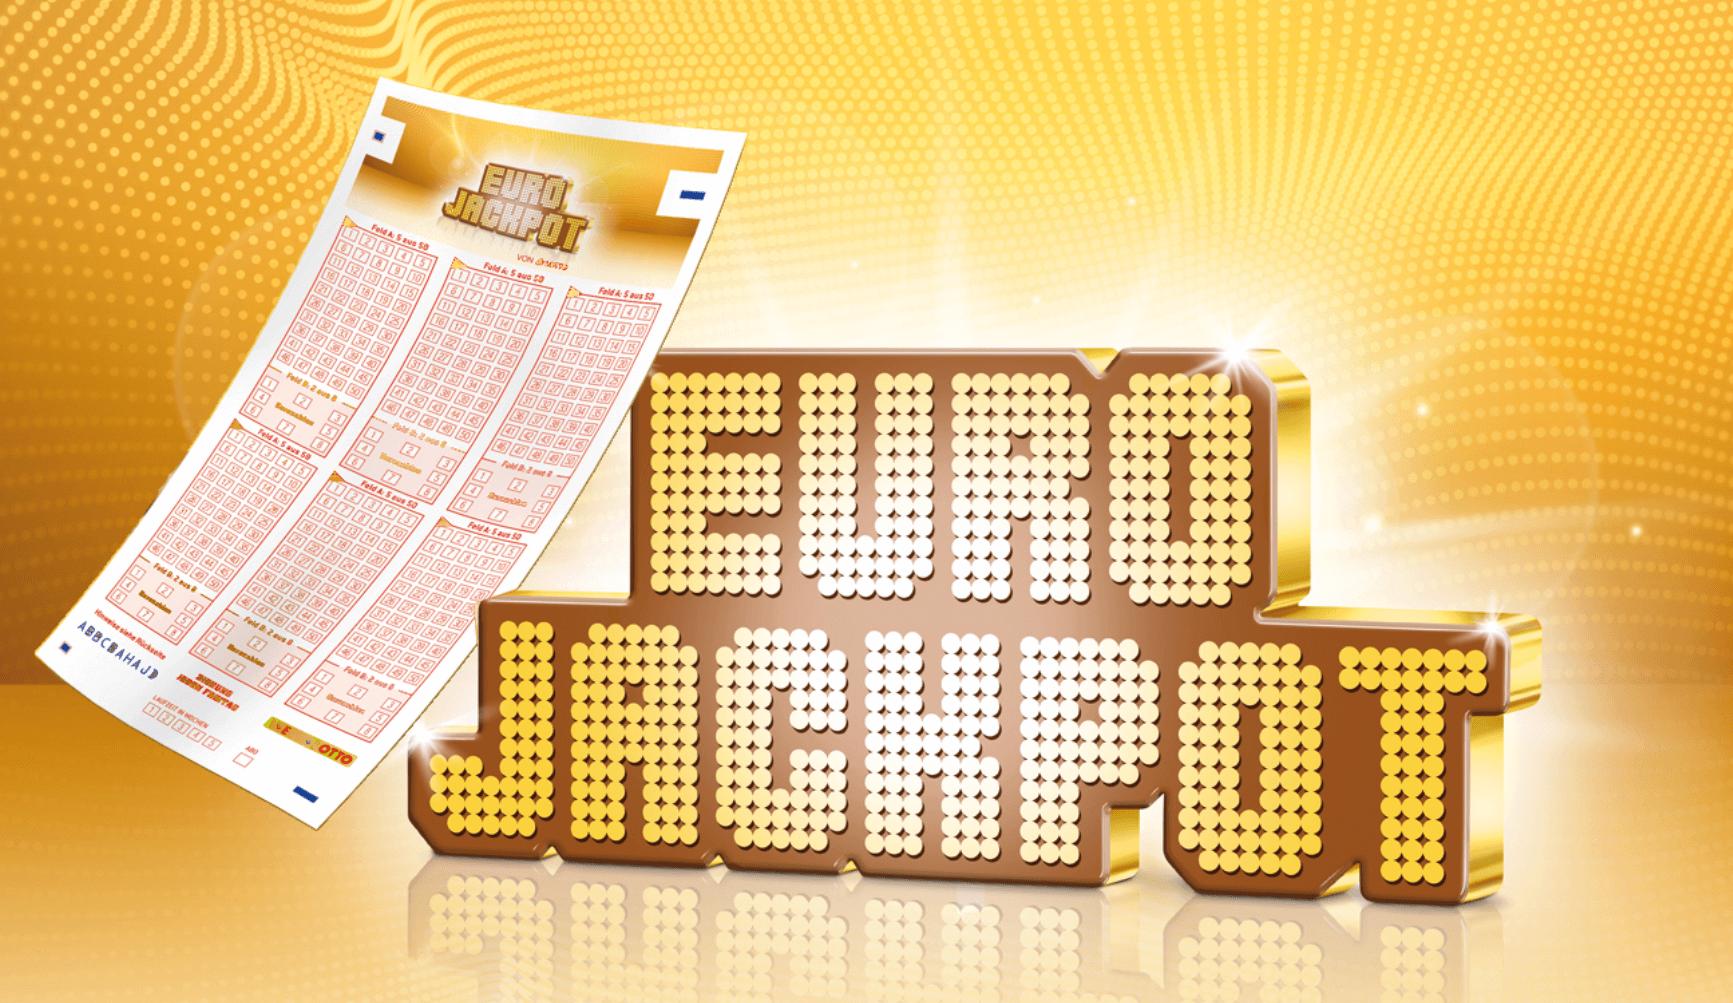 Eurojackpot logo